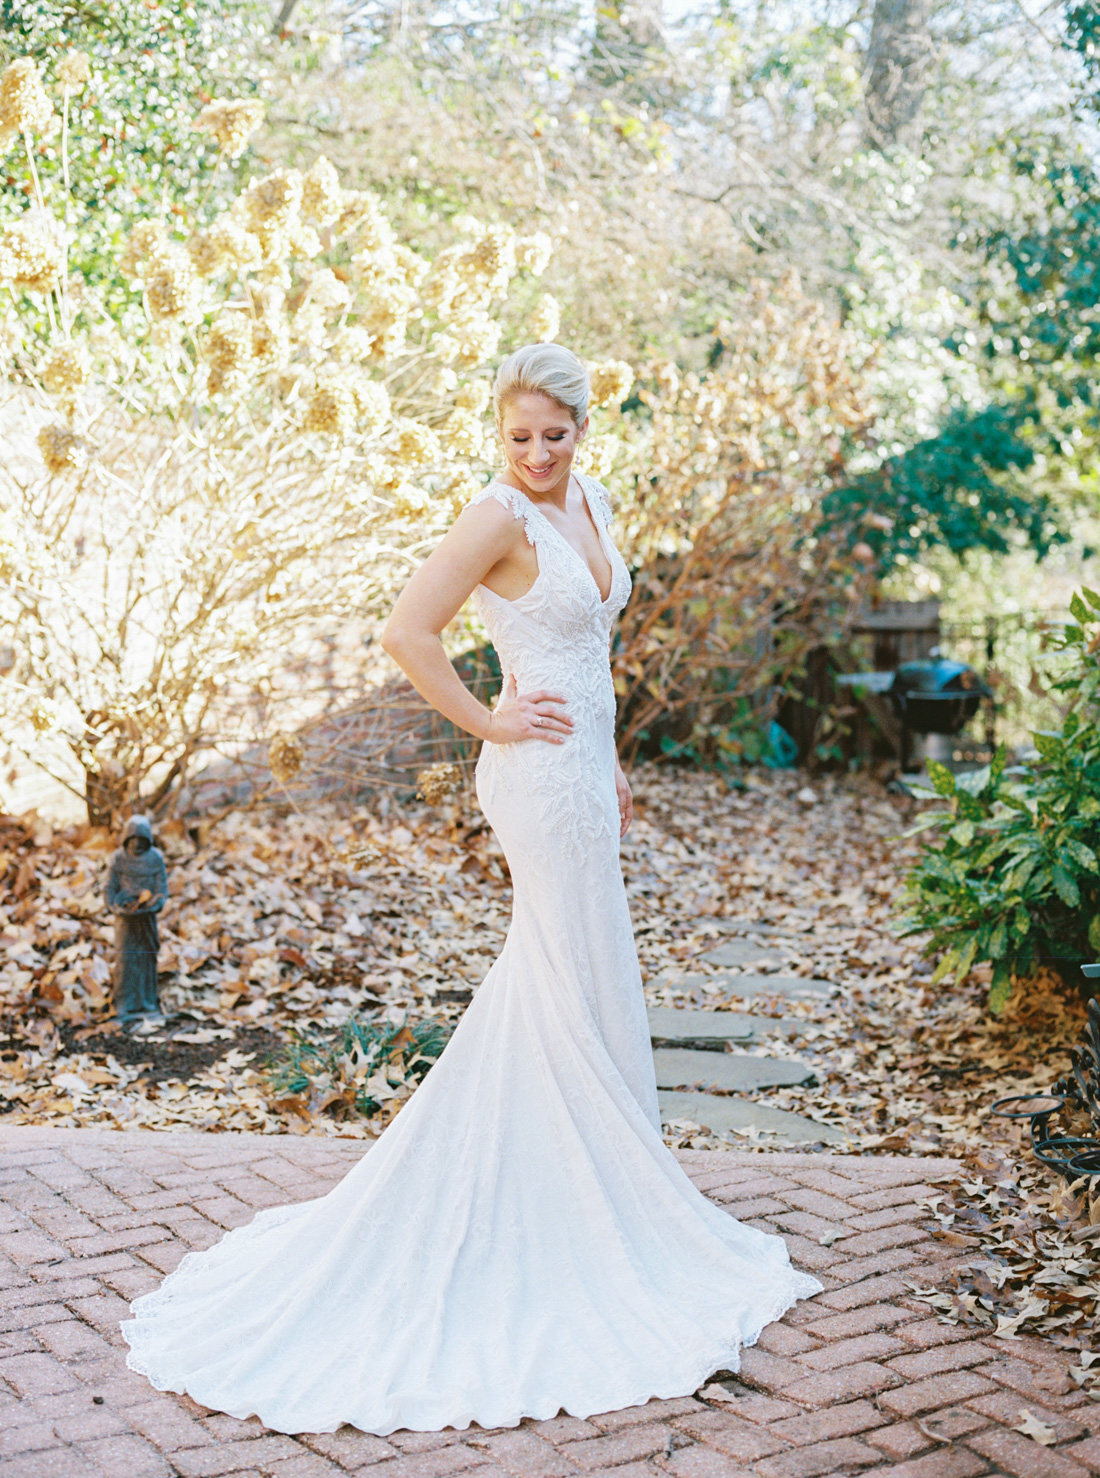 Justin-alexander-old-hollywood-beaded-wedding-dress